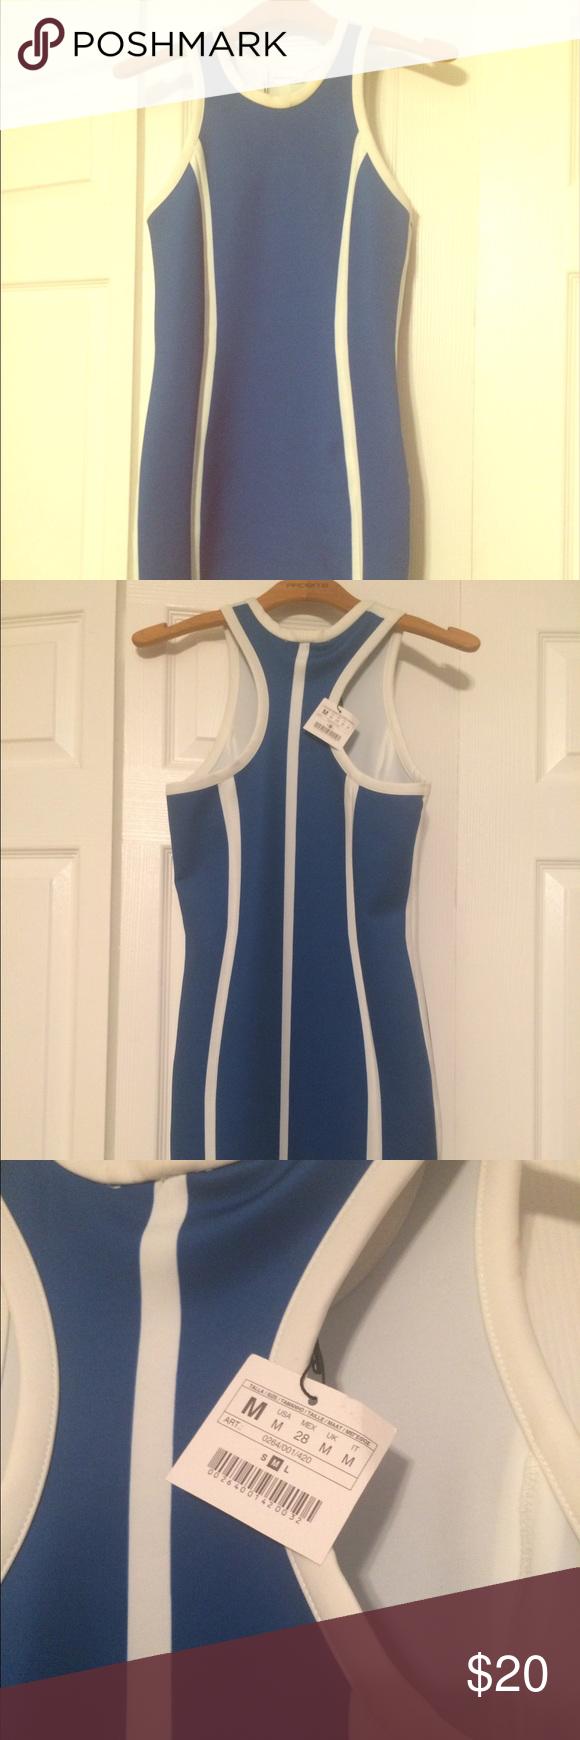 Zara Racerback Dress Zara Racerback Dress, Sporty Chic.  Bought from another Posher but it did not fit. Zara Dresses